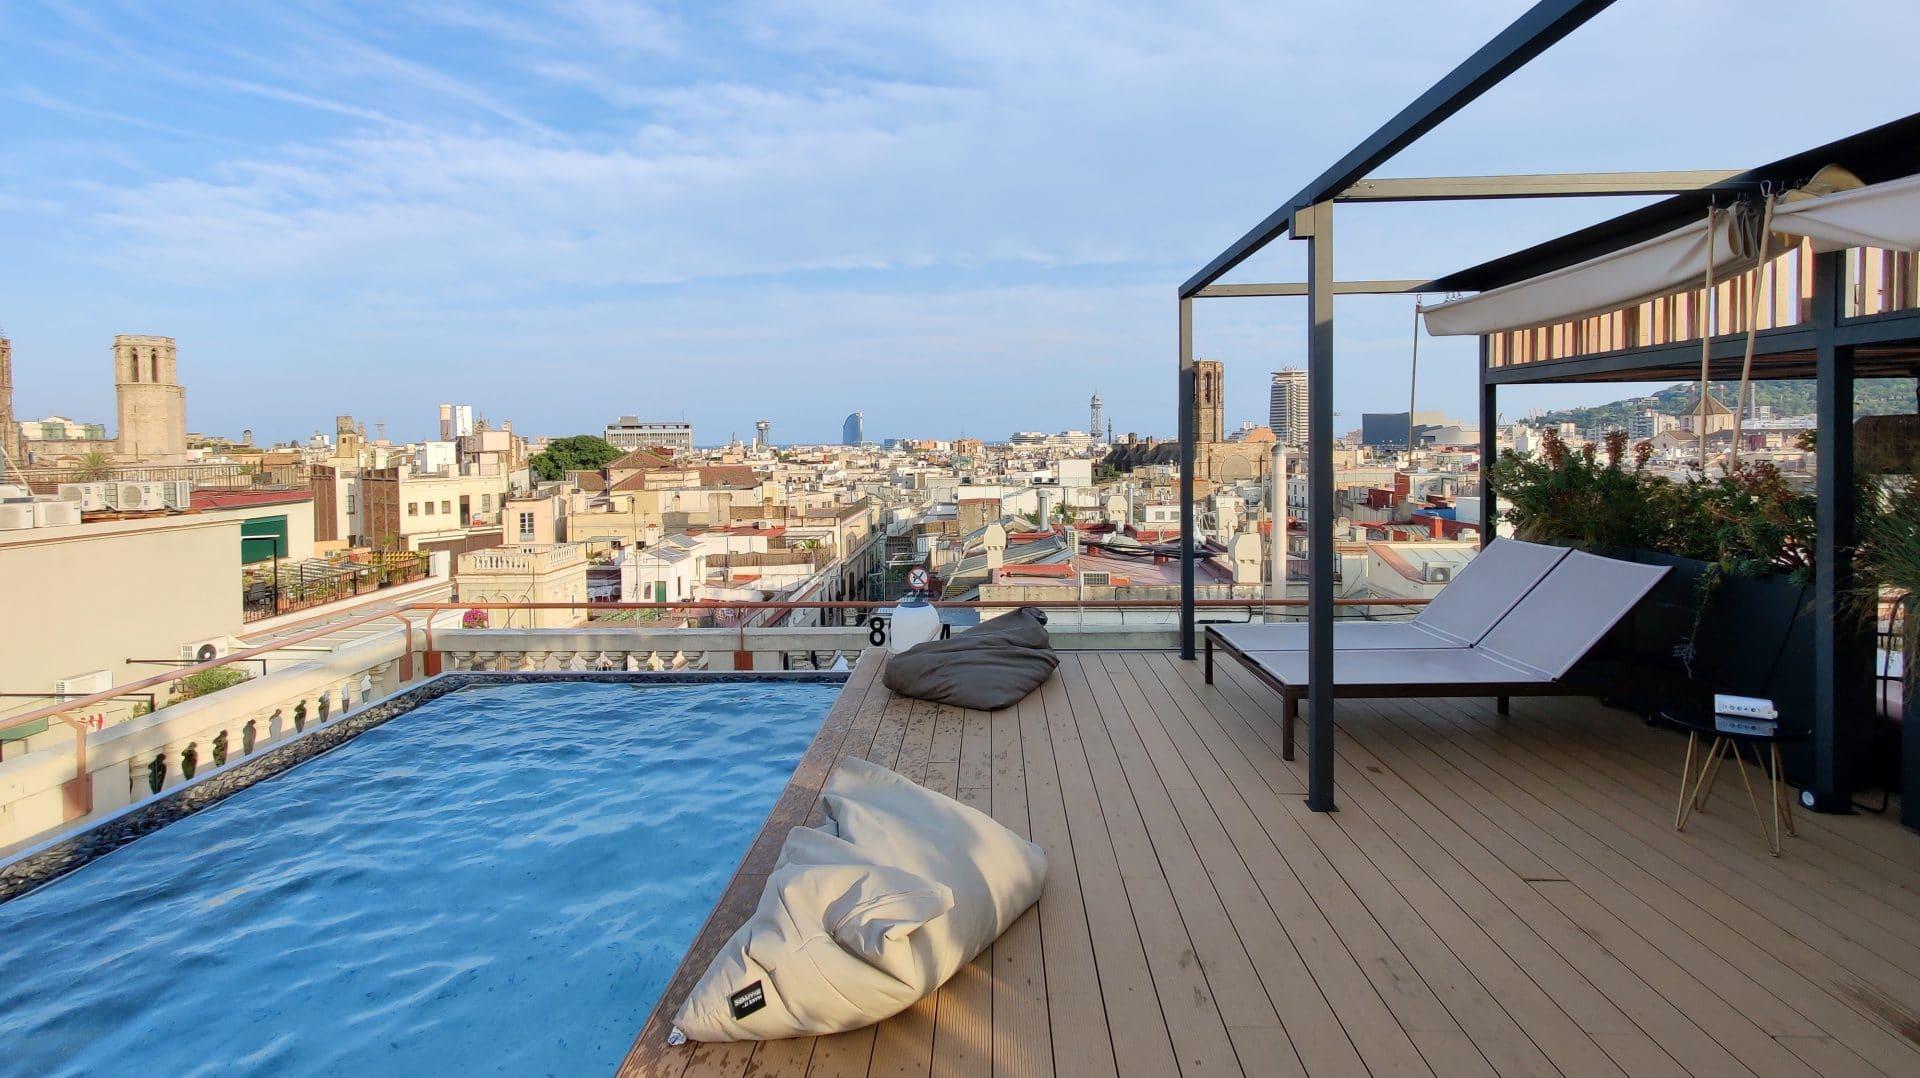 Kimpton Vividora Barcelona Rooftop Pool 4